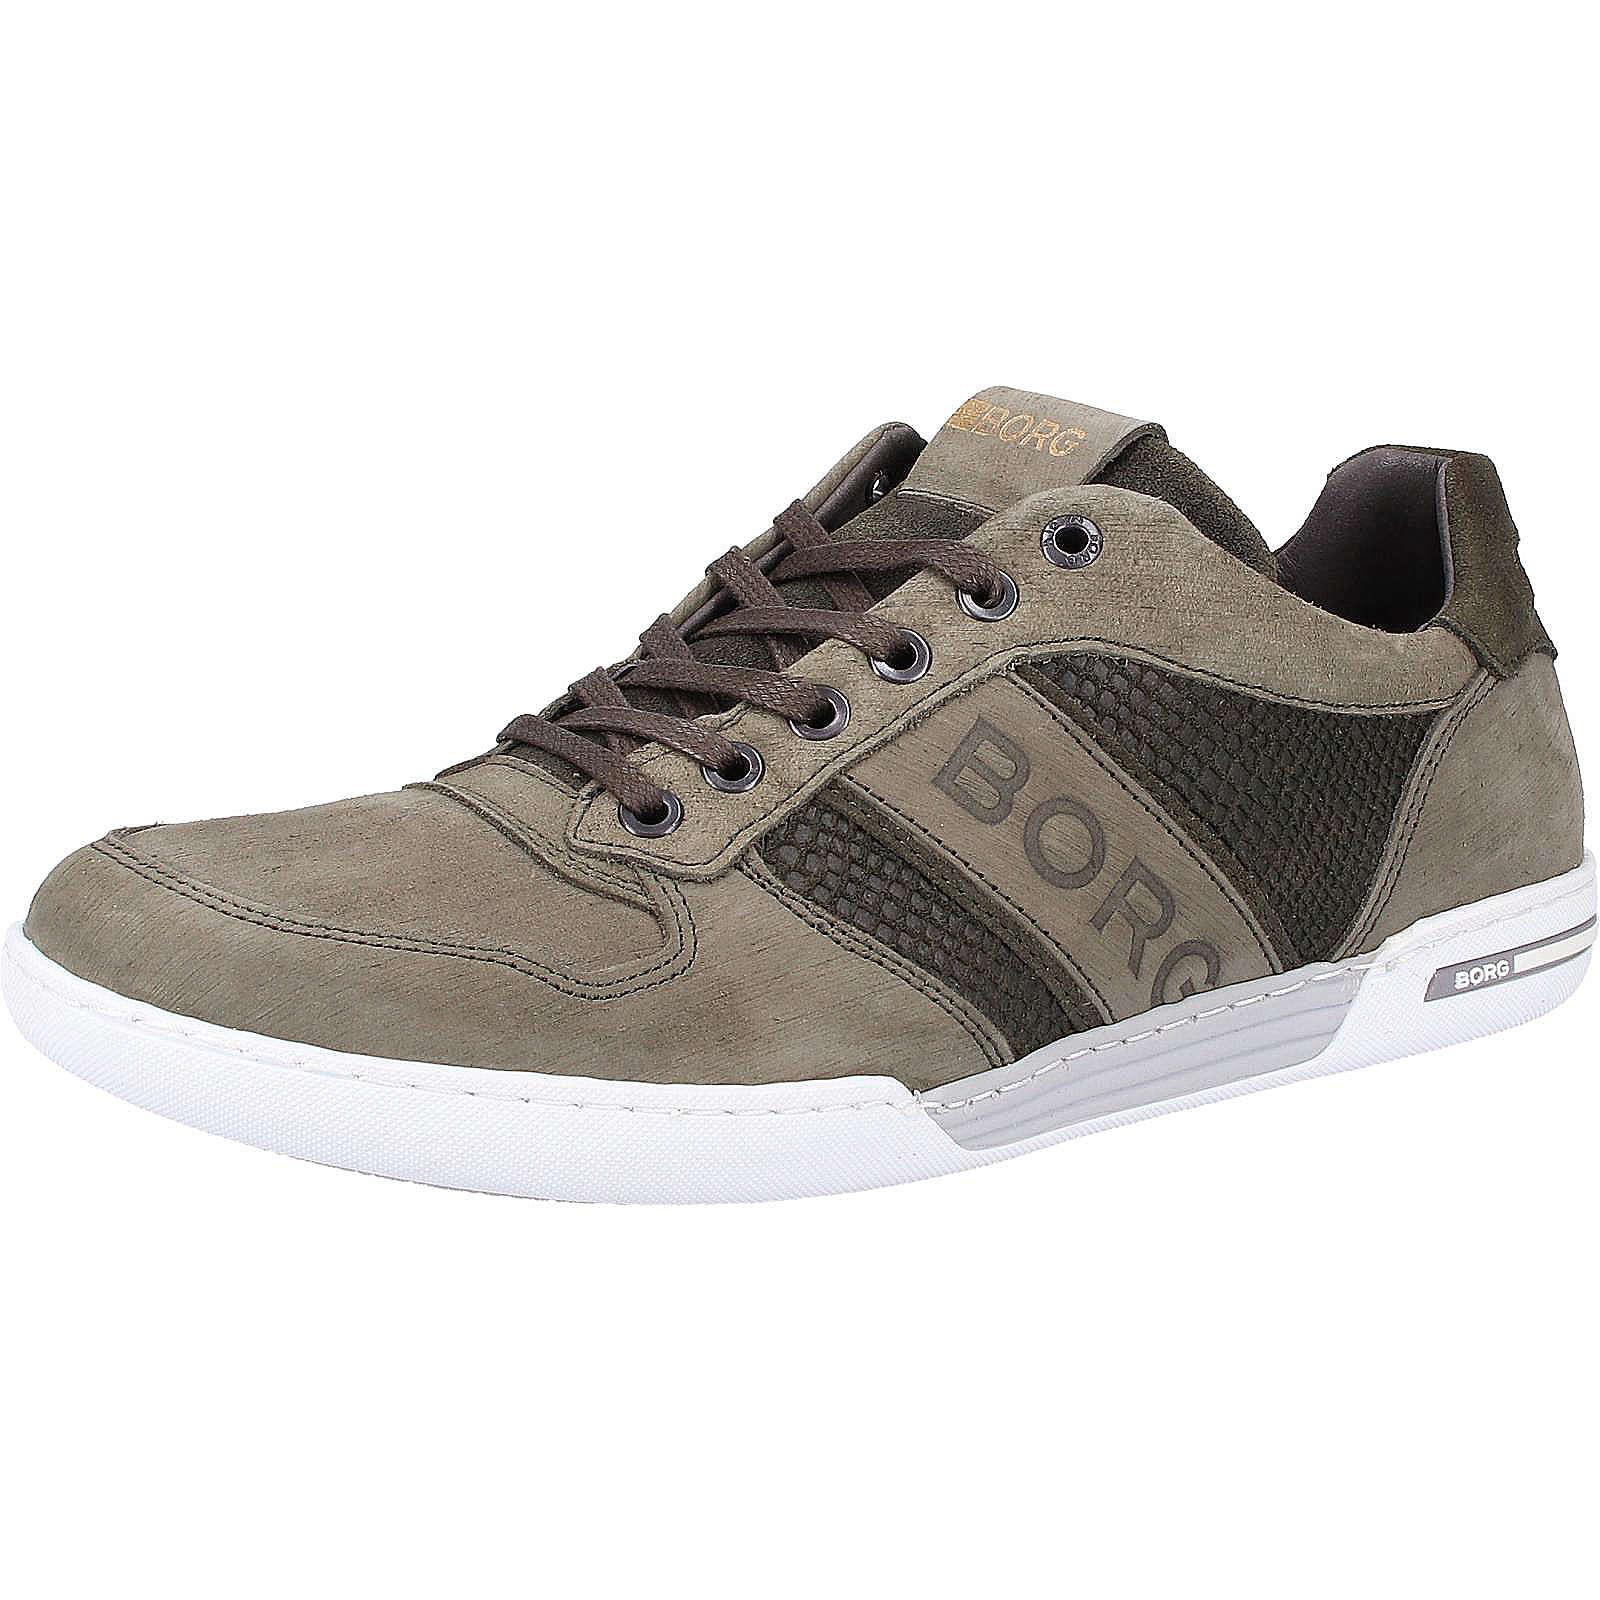 BJÖRN BORG Sneaker Sneakers Low khaki Herren Gr. 40